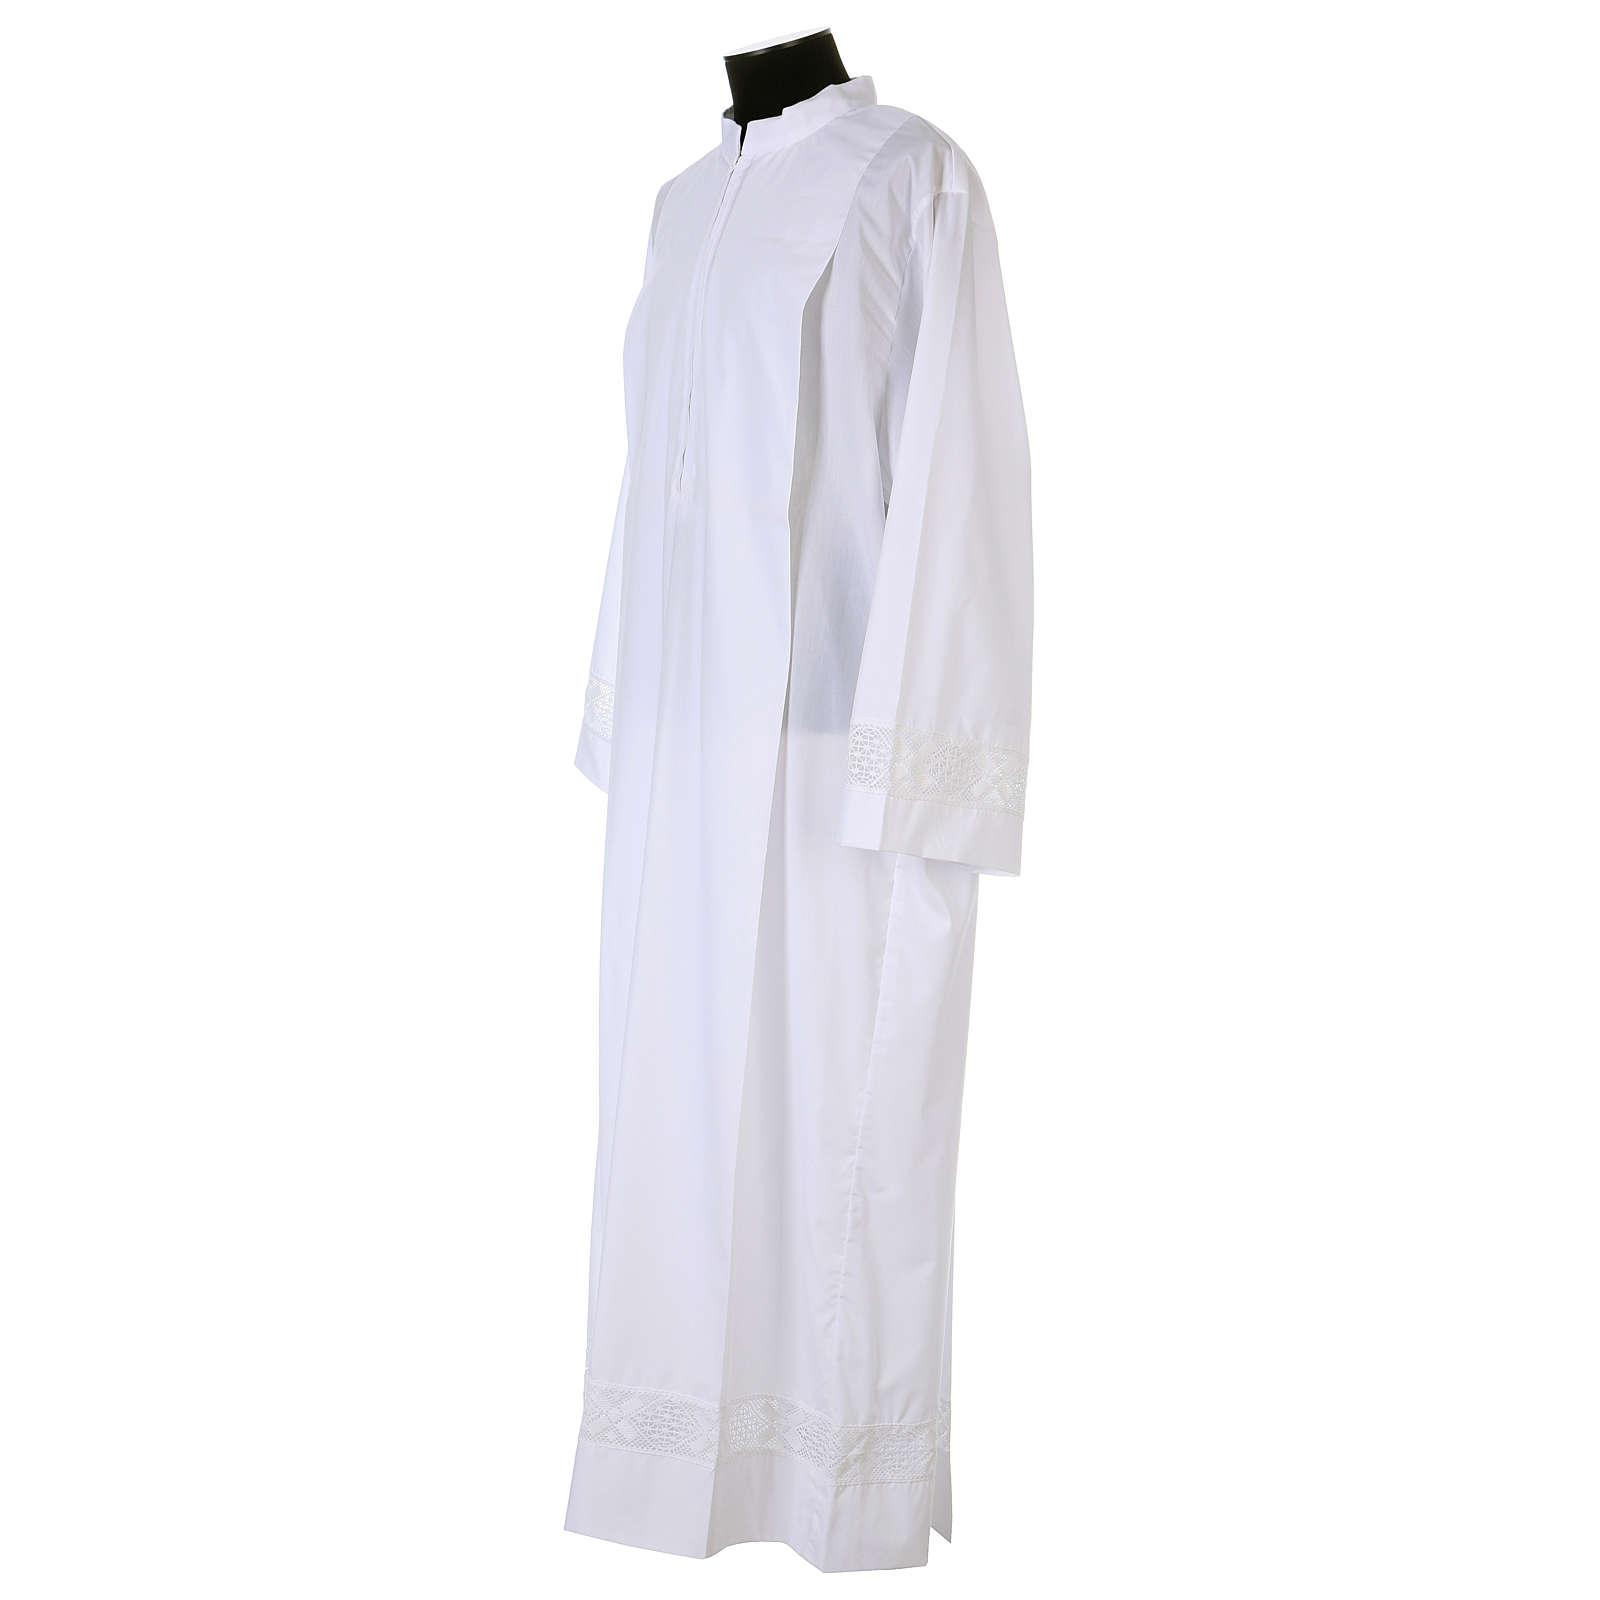 Alba blanca 65% poliéster 35% algodón entredós encaje cremallera parte anterior 4